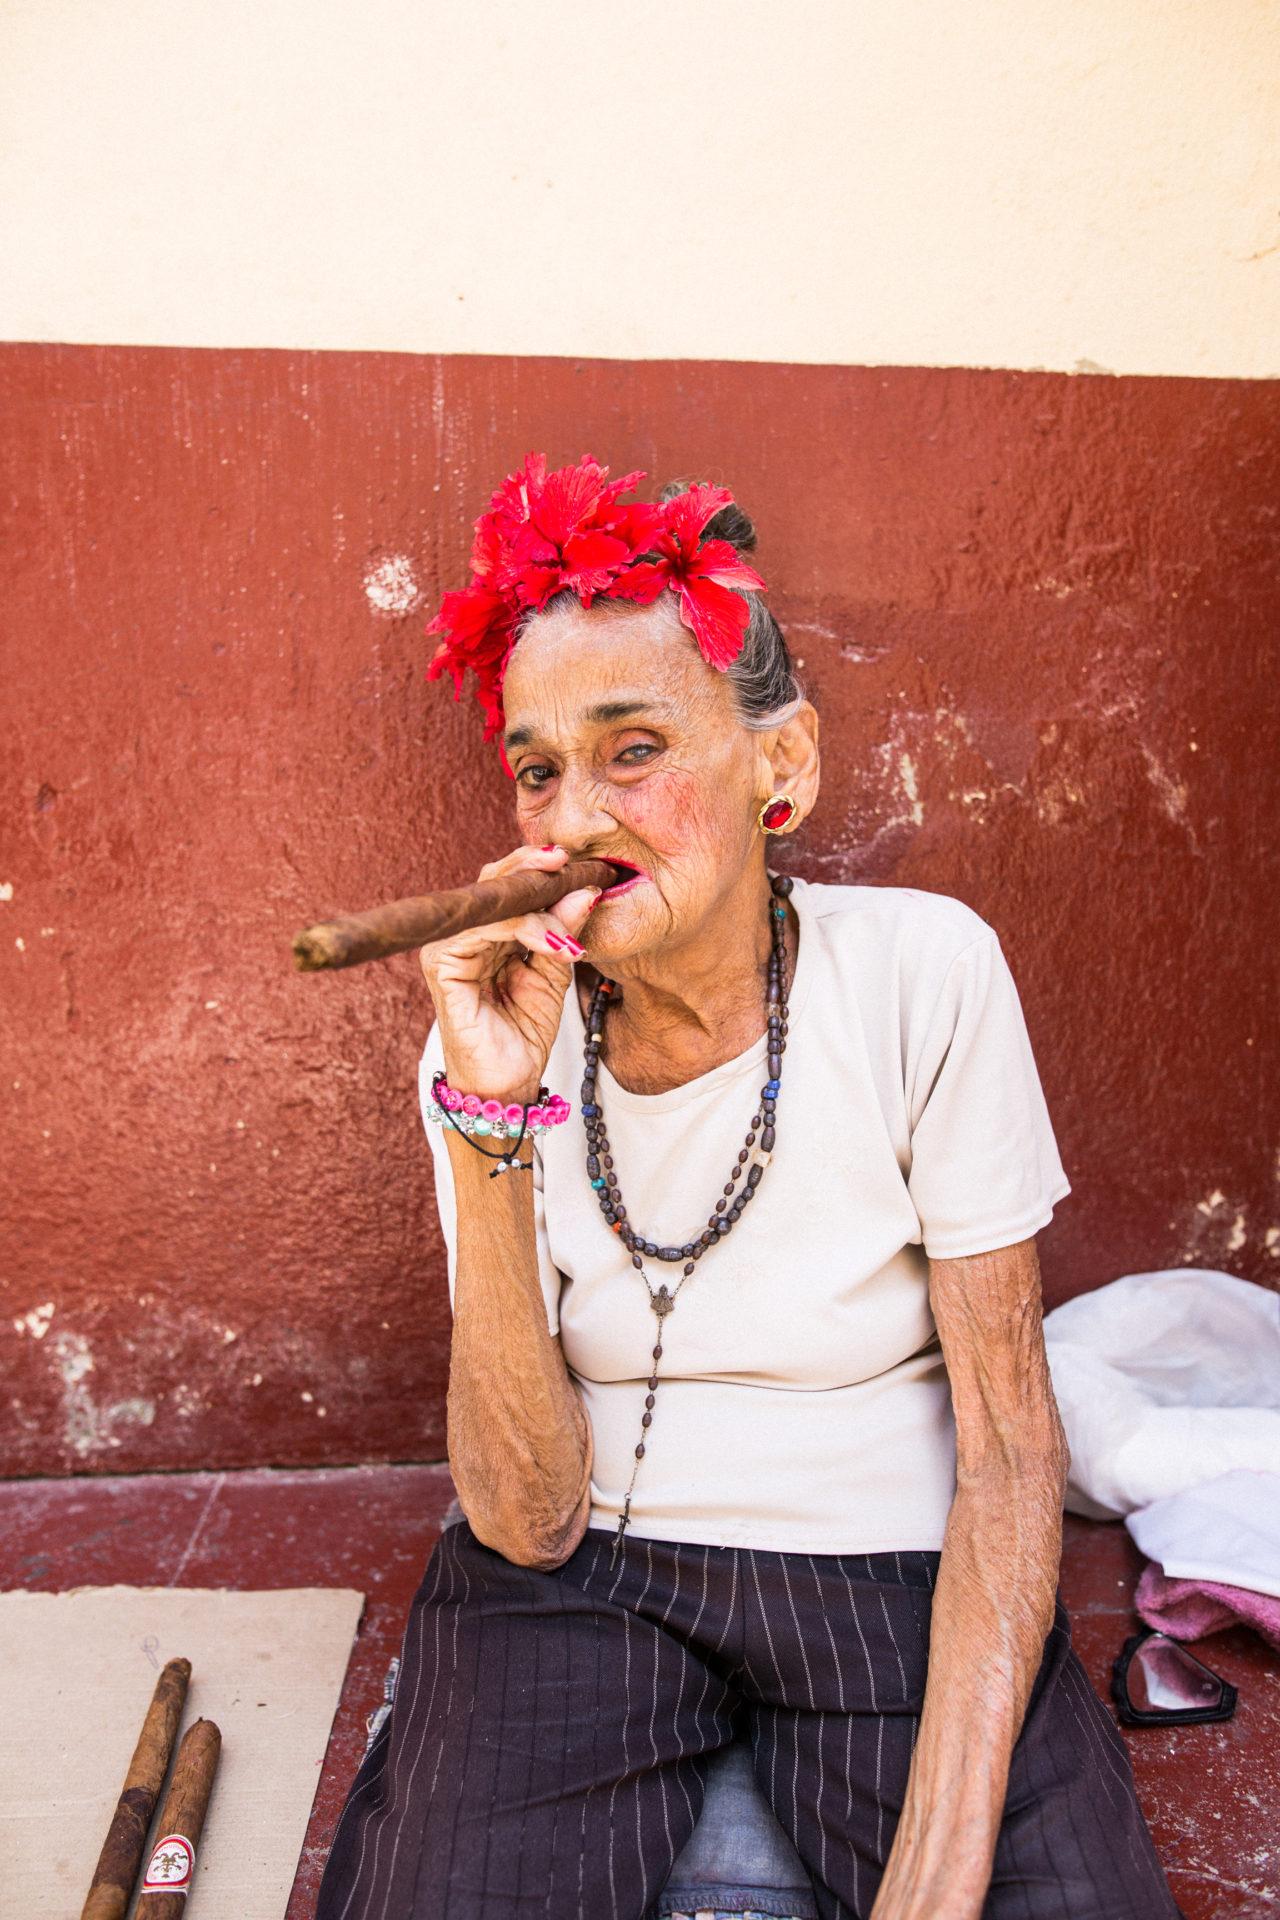 MrKate_Cuba_Summary_Blog (78 of 132)